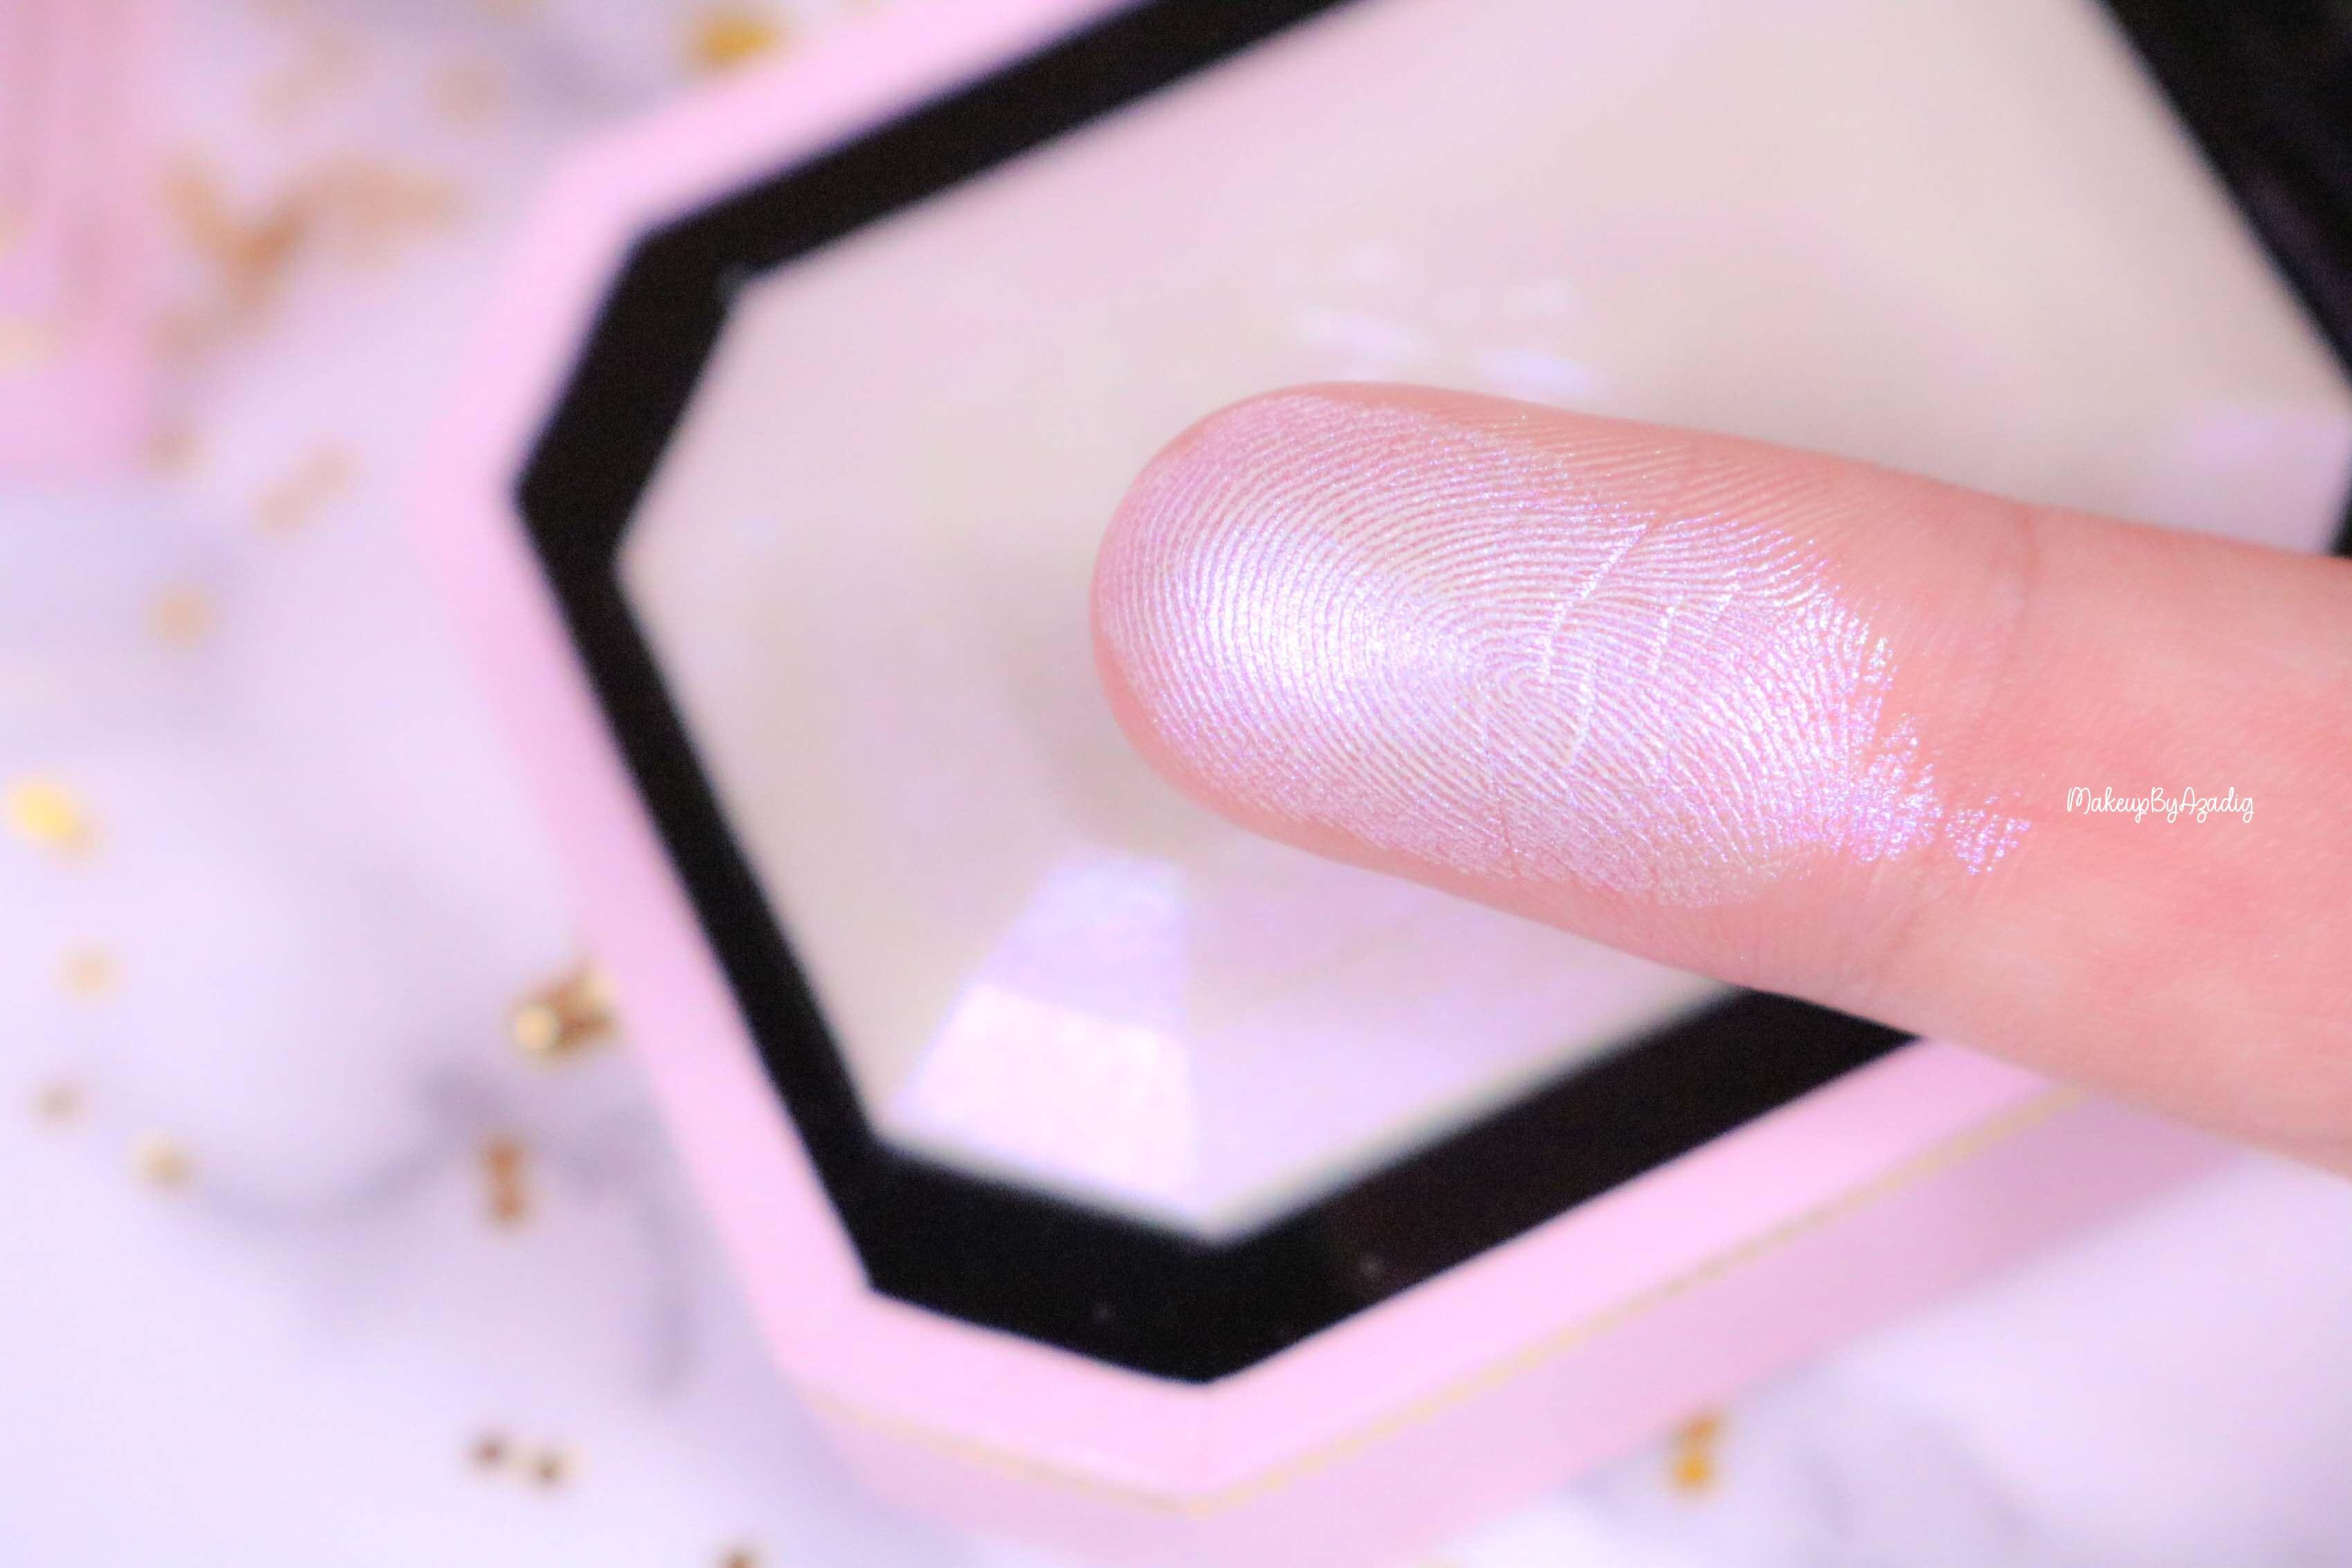 revue-highlighter-diamond-light-toofaced-enlumineur-diamant-collection-makeup-makeupbyazadig-sortie-france-influencer-swatch-avis-prix-swatches